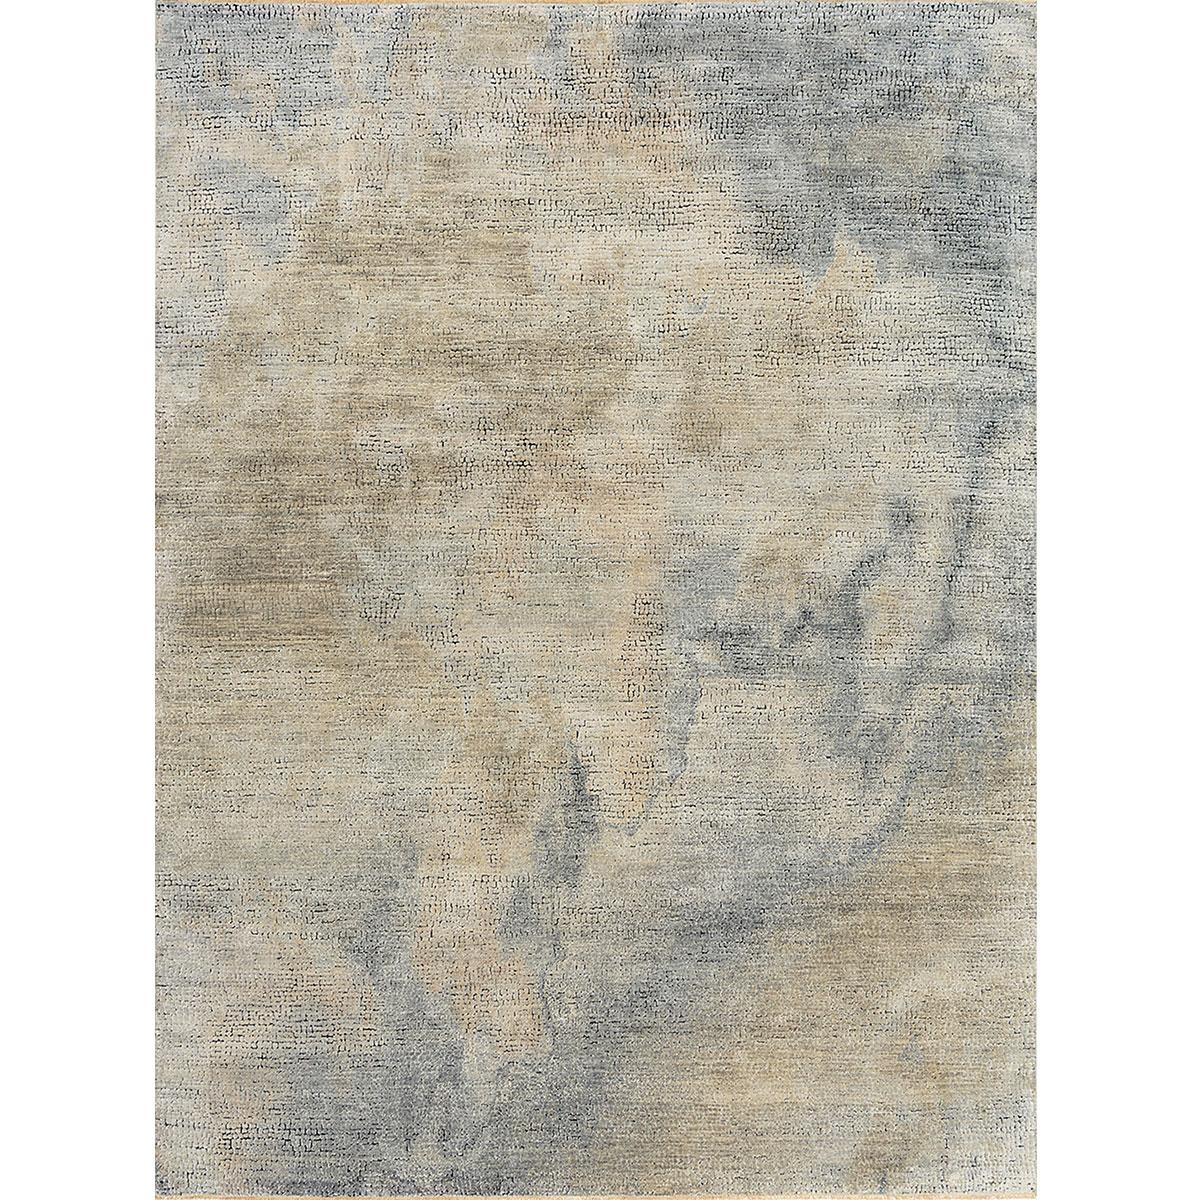 cumulae_wool-silk_hand-knotted_patterson-flynn-martin_pfm